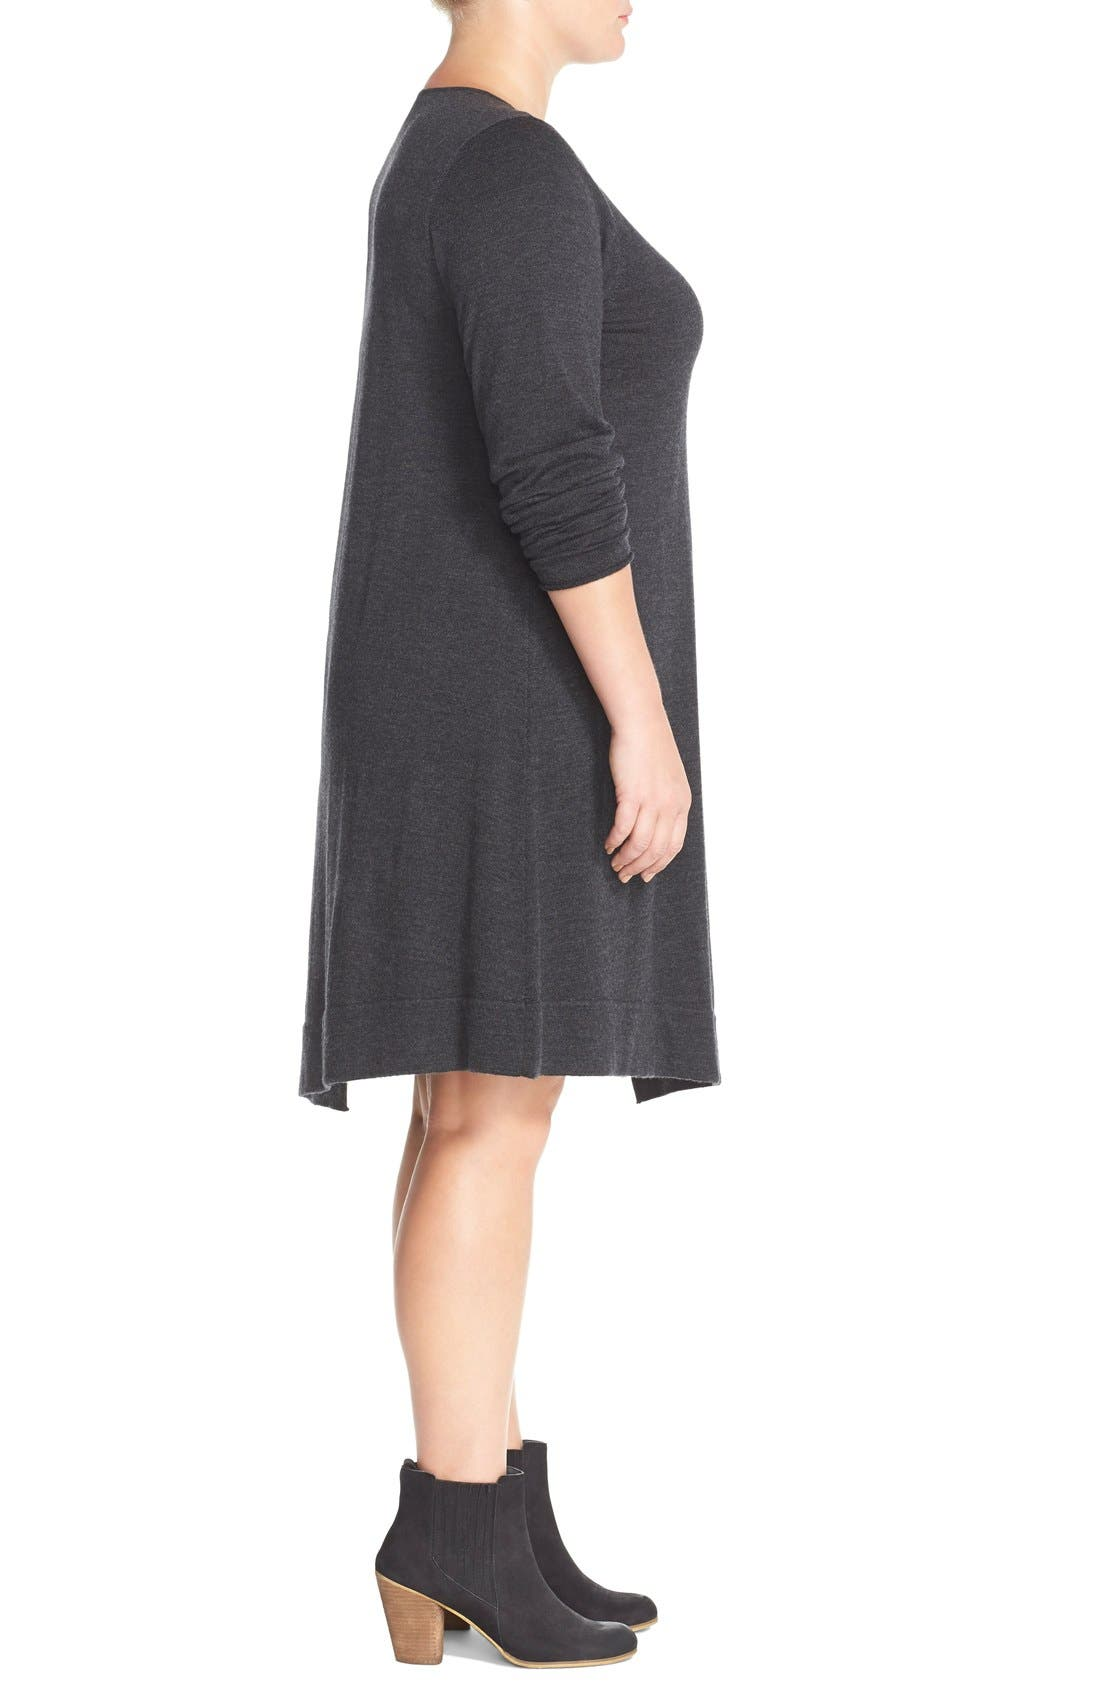 Alternate Image 3  - Eileen Fisher Merino Jersey Jewel Neck Dress (Plus Size)